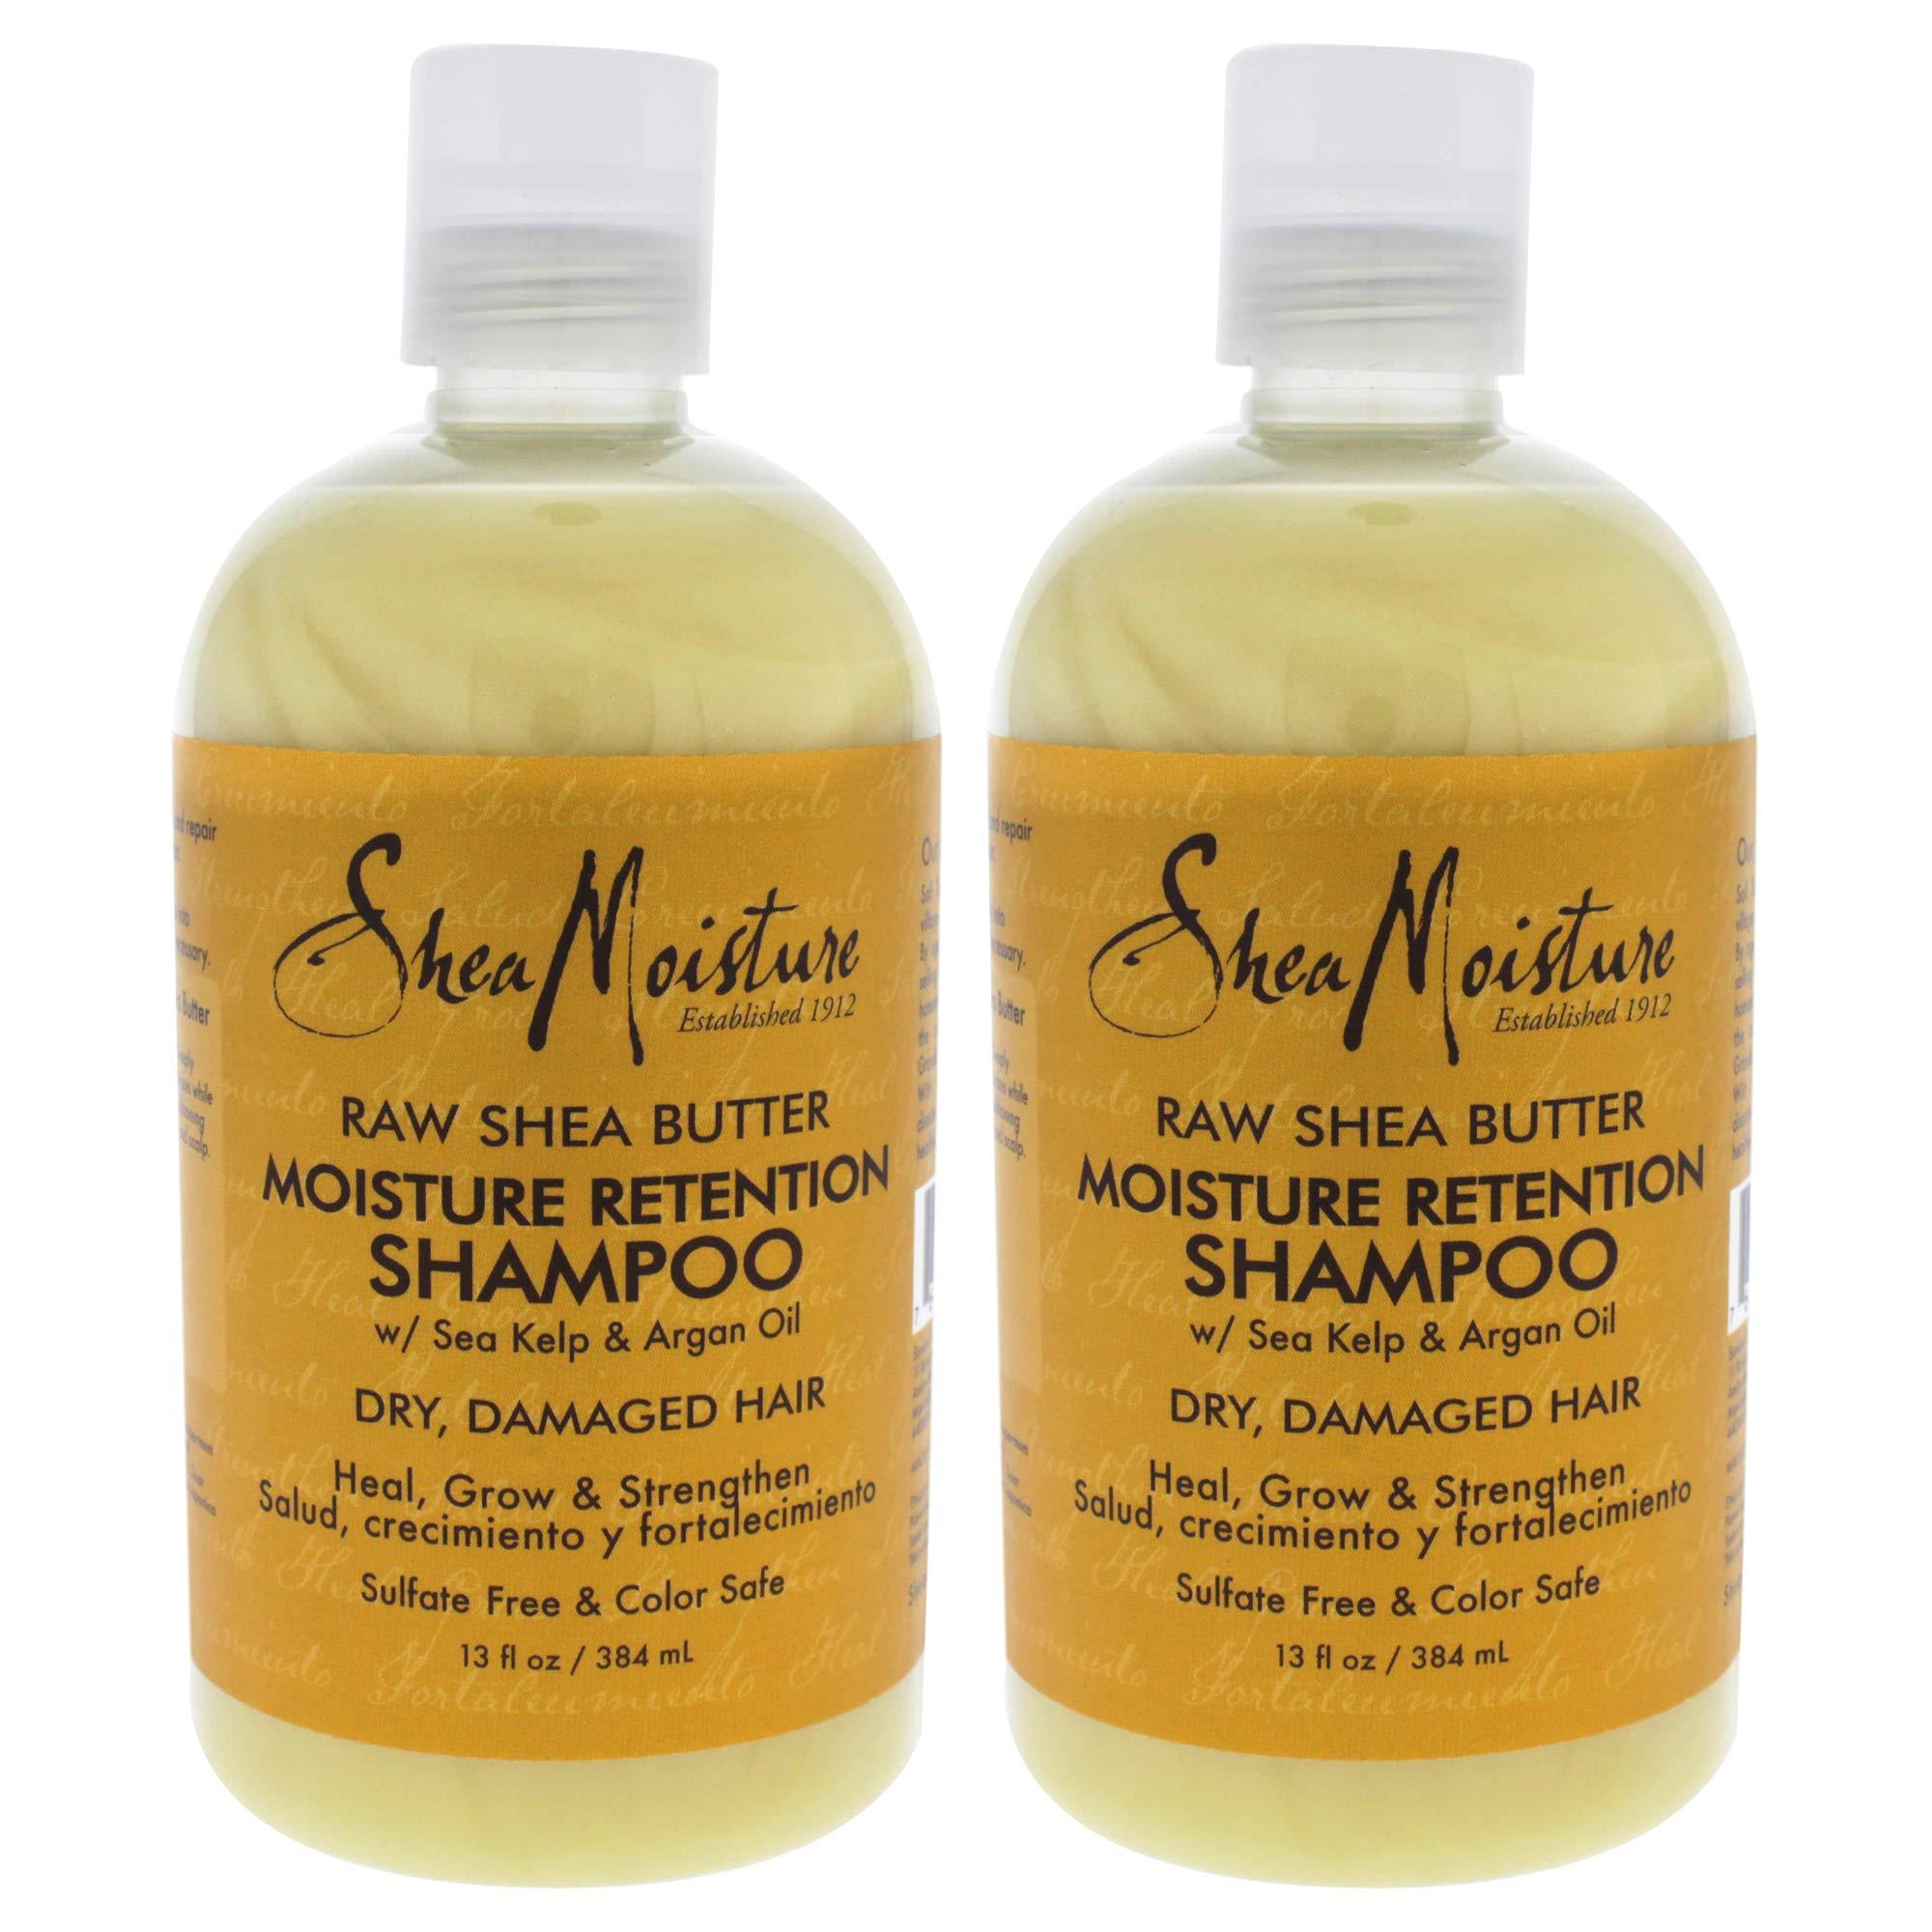 Raw Shea Butter Moisture Retention Shampoo by Shea Moisture for Unisex - 13 oz Shampoo - Pack of 2